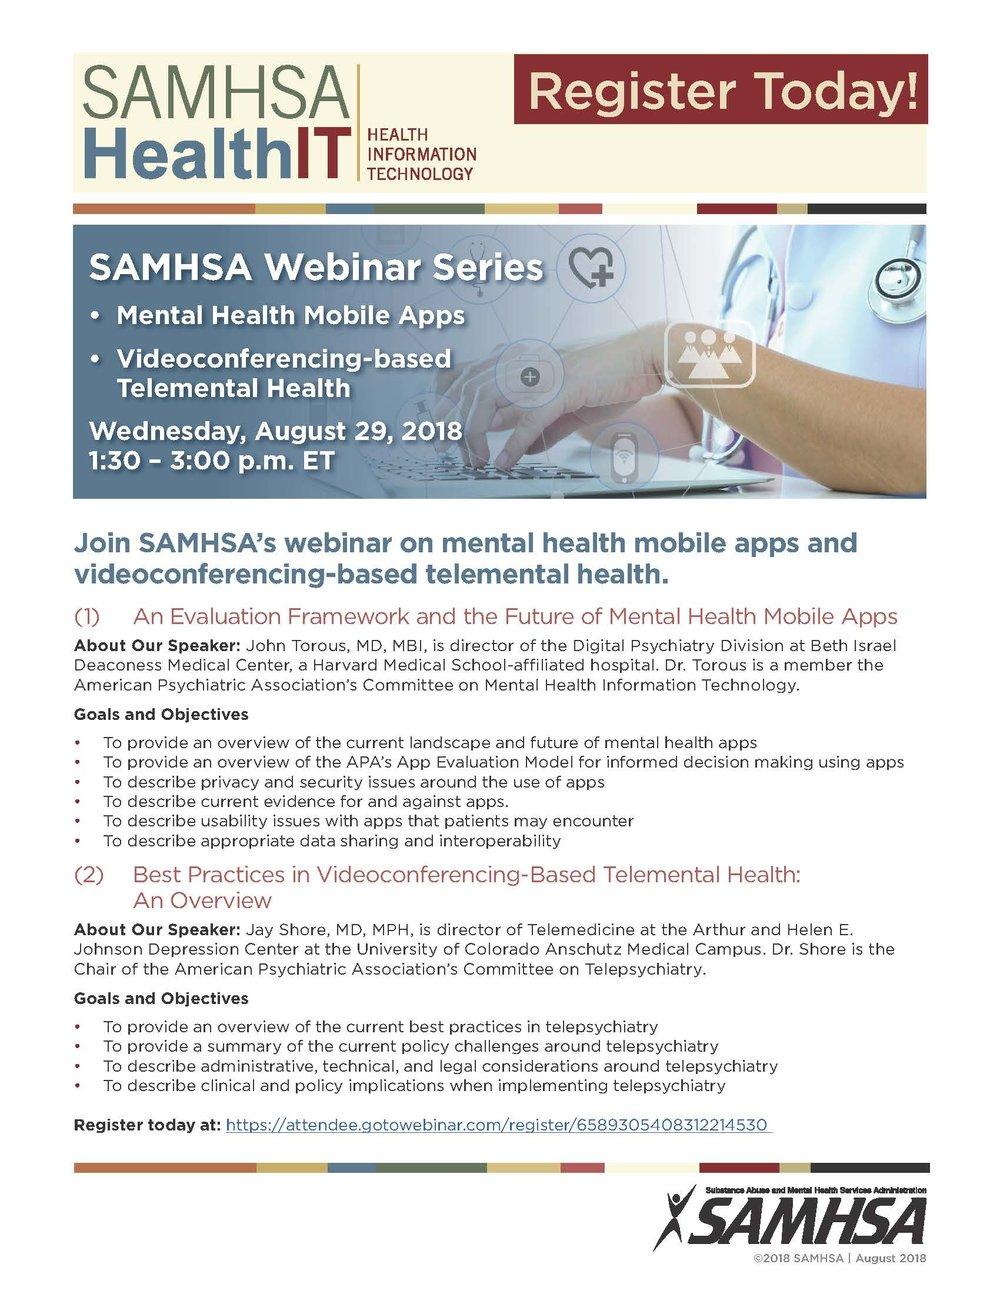 SAMHSA Health IT Webinar Series Flyer August_29_2018.jpg